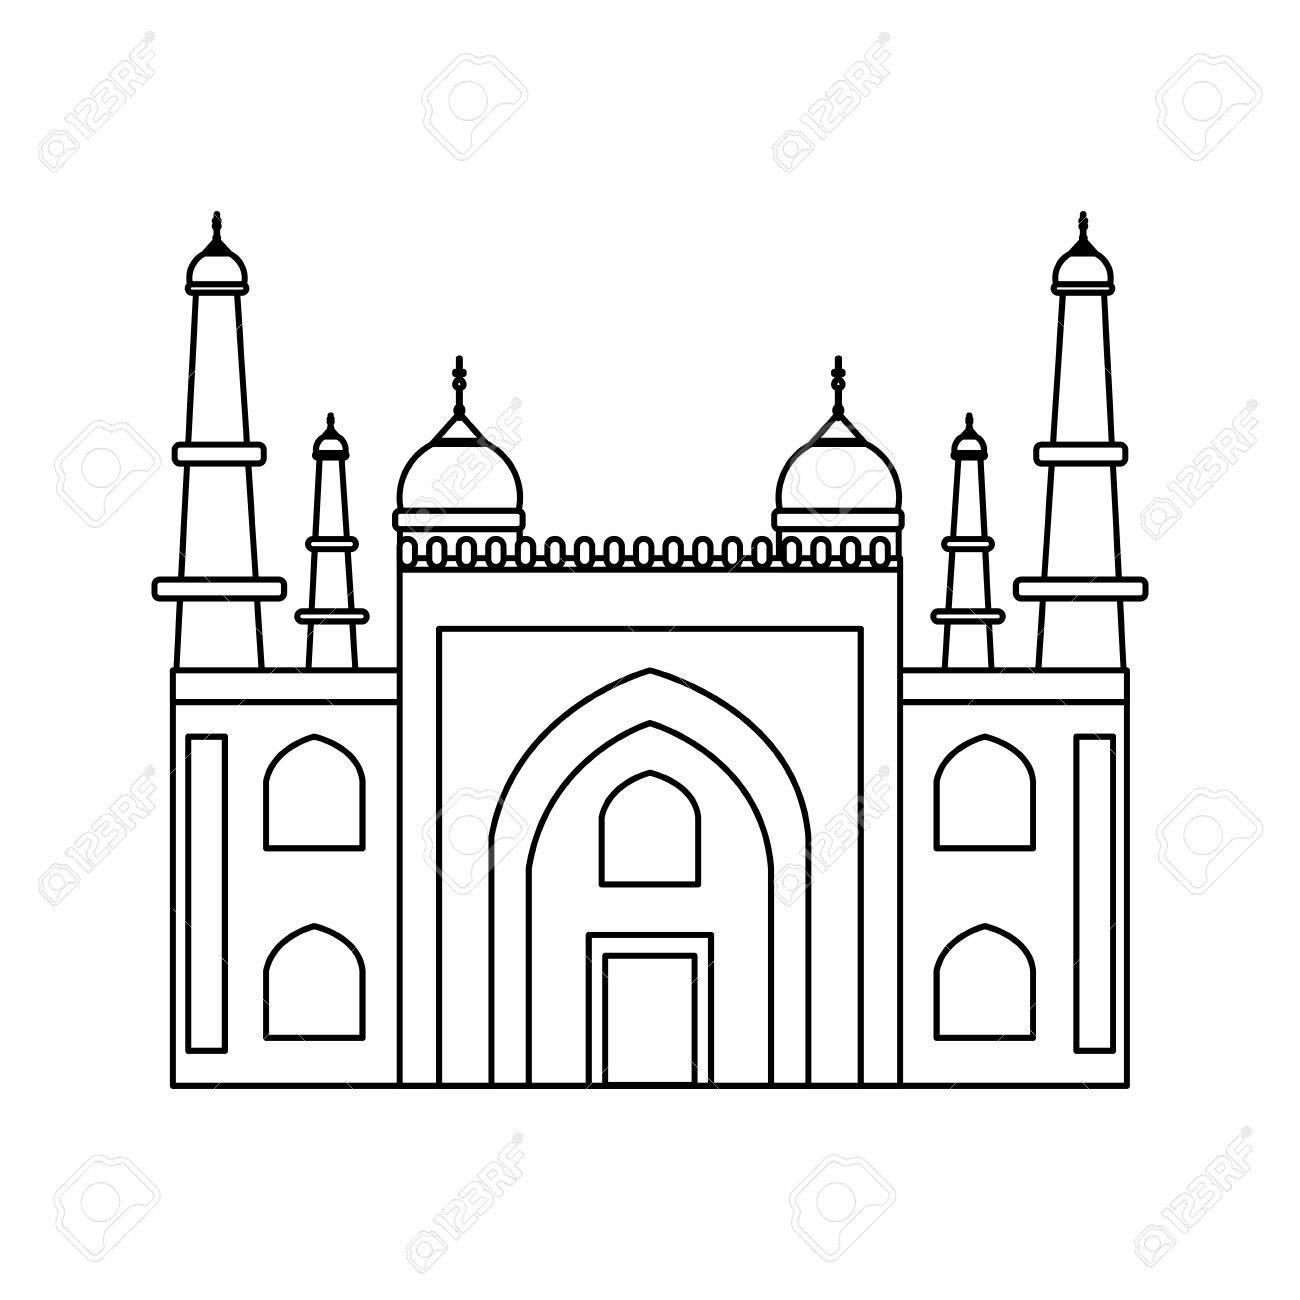 Palace clipart illustration. Mysore x free clip